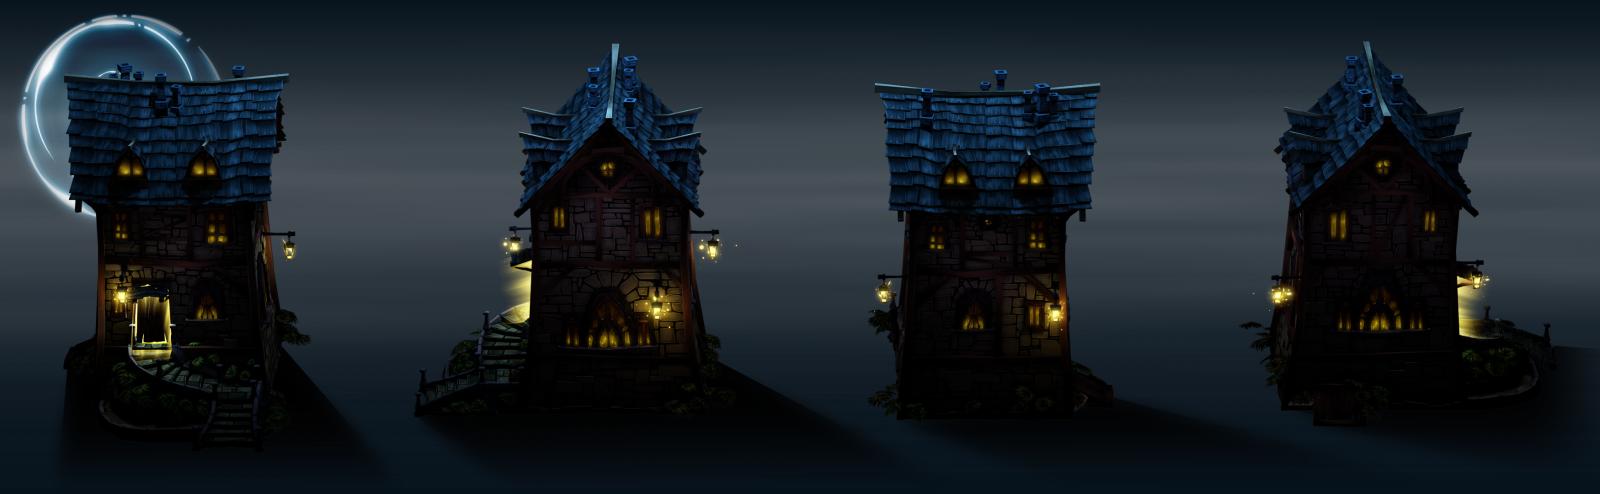 Tristram's House